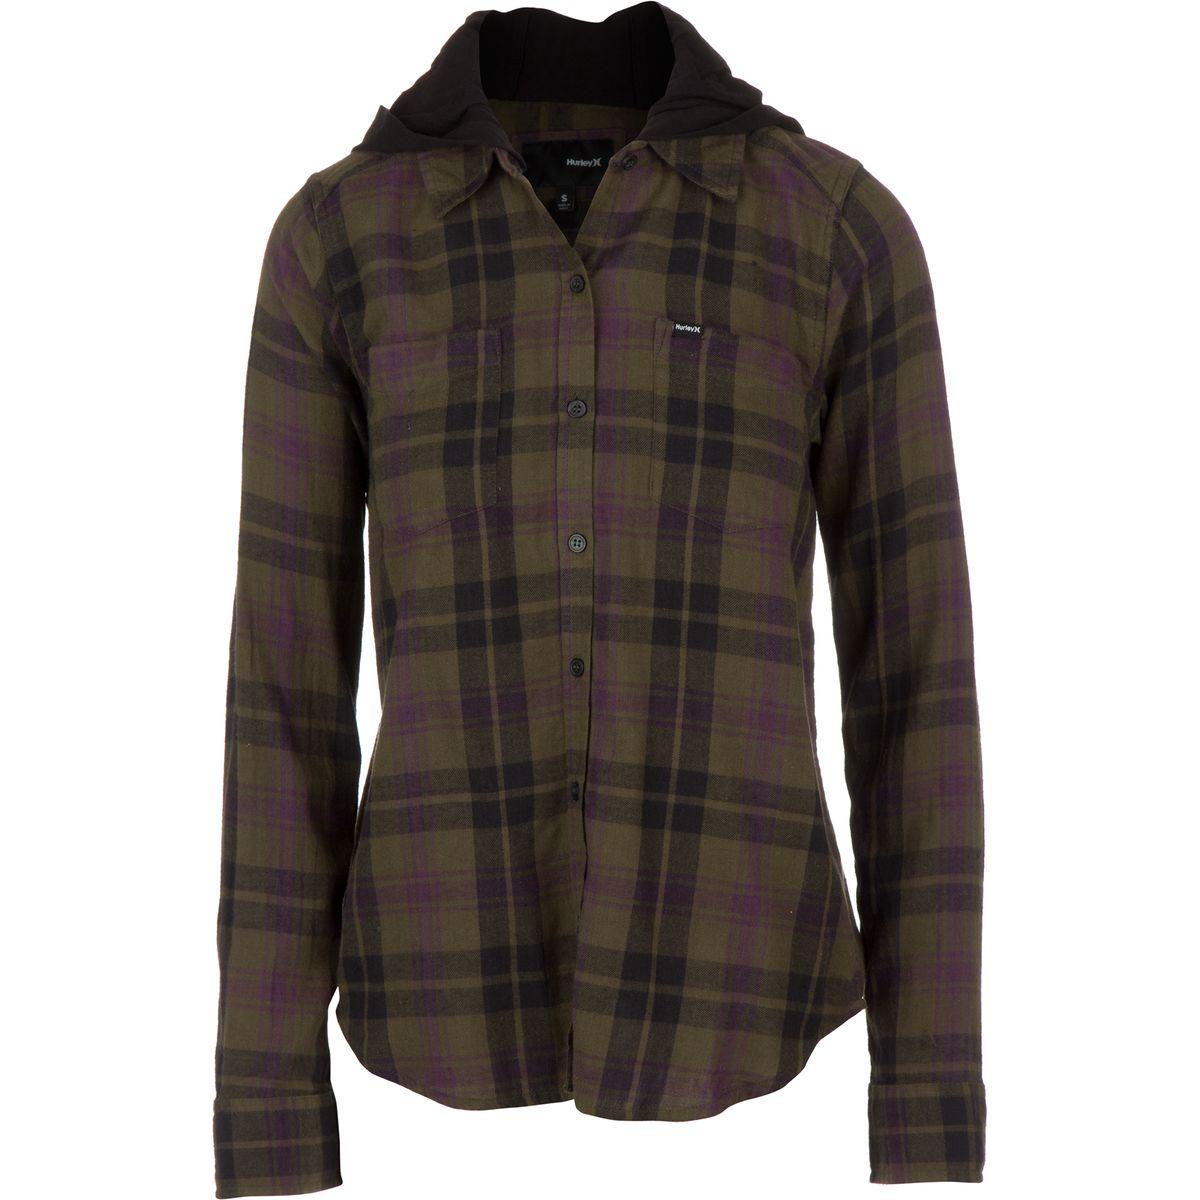 Hurley Wilson Hooded Shirt - Long-Sleeve - Women